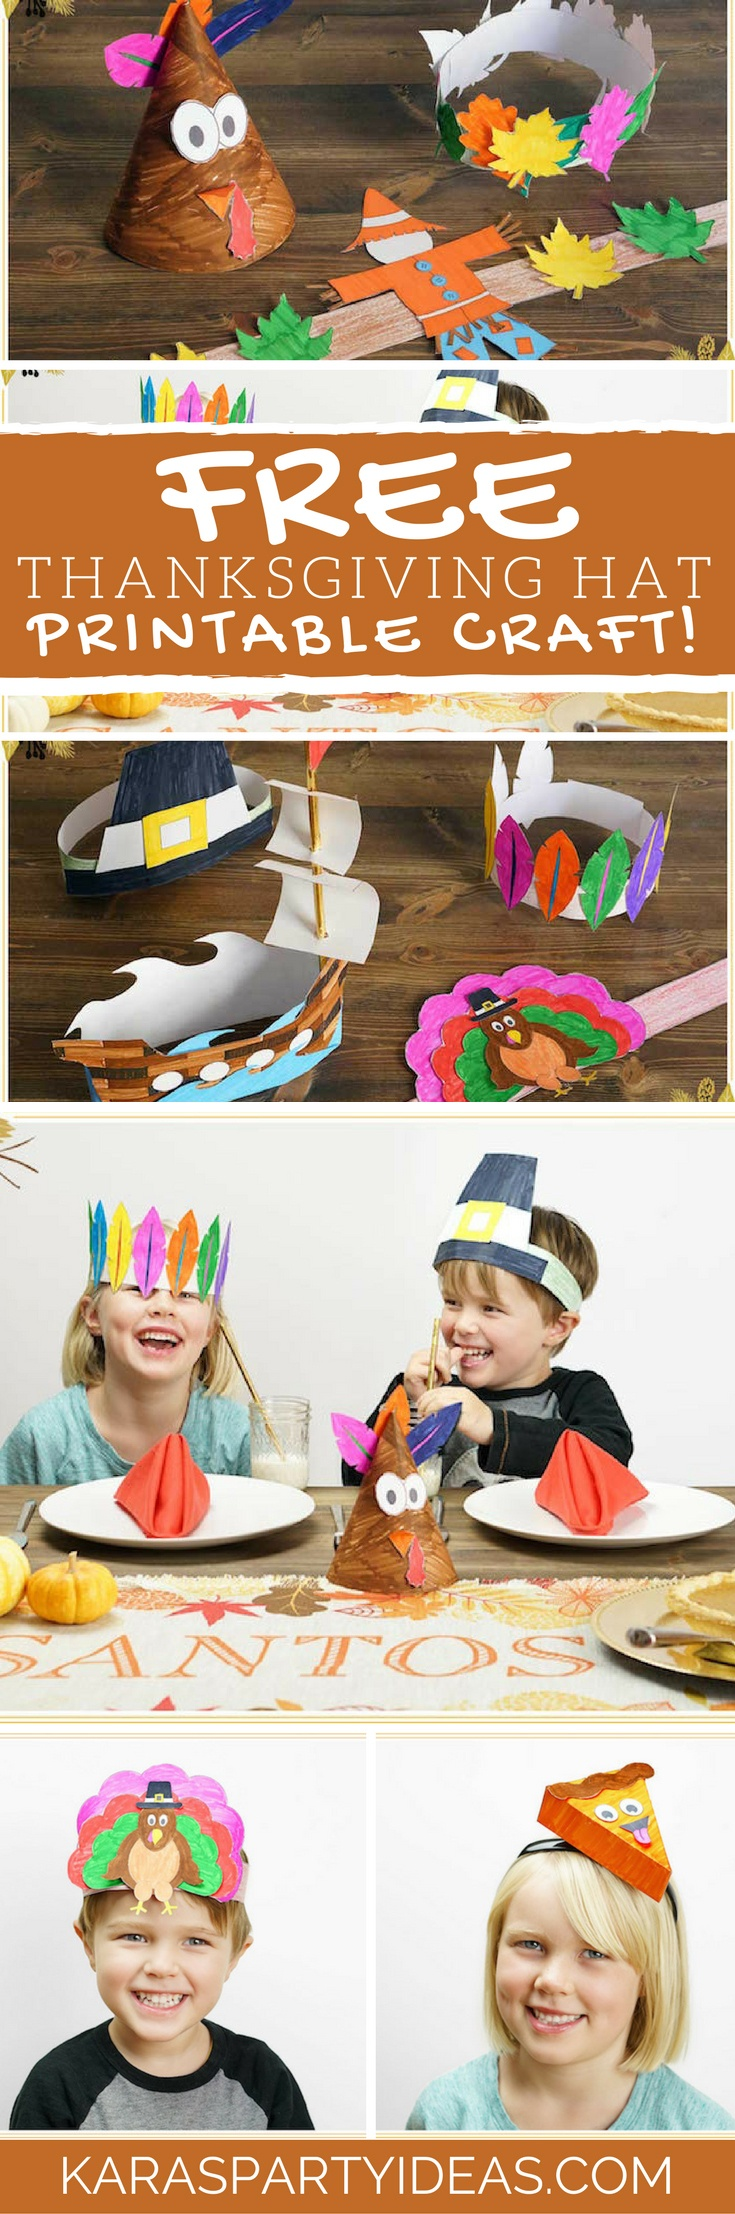 Kara's Party Ideas Free Thanksgiving Hat Printable Crafts | Kara's - Free Printable Thanksgiving Hats